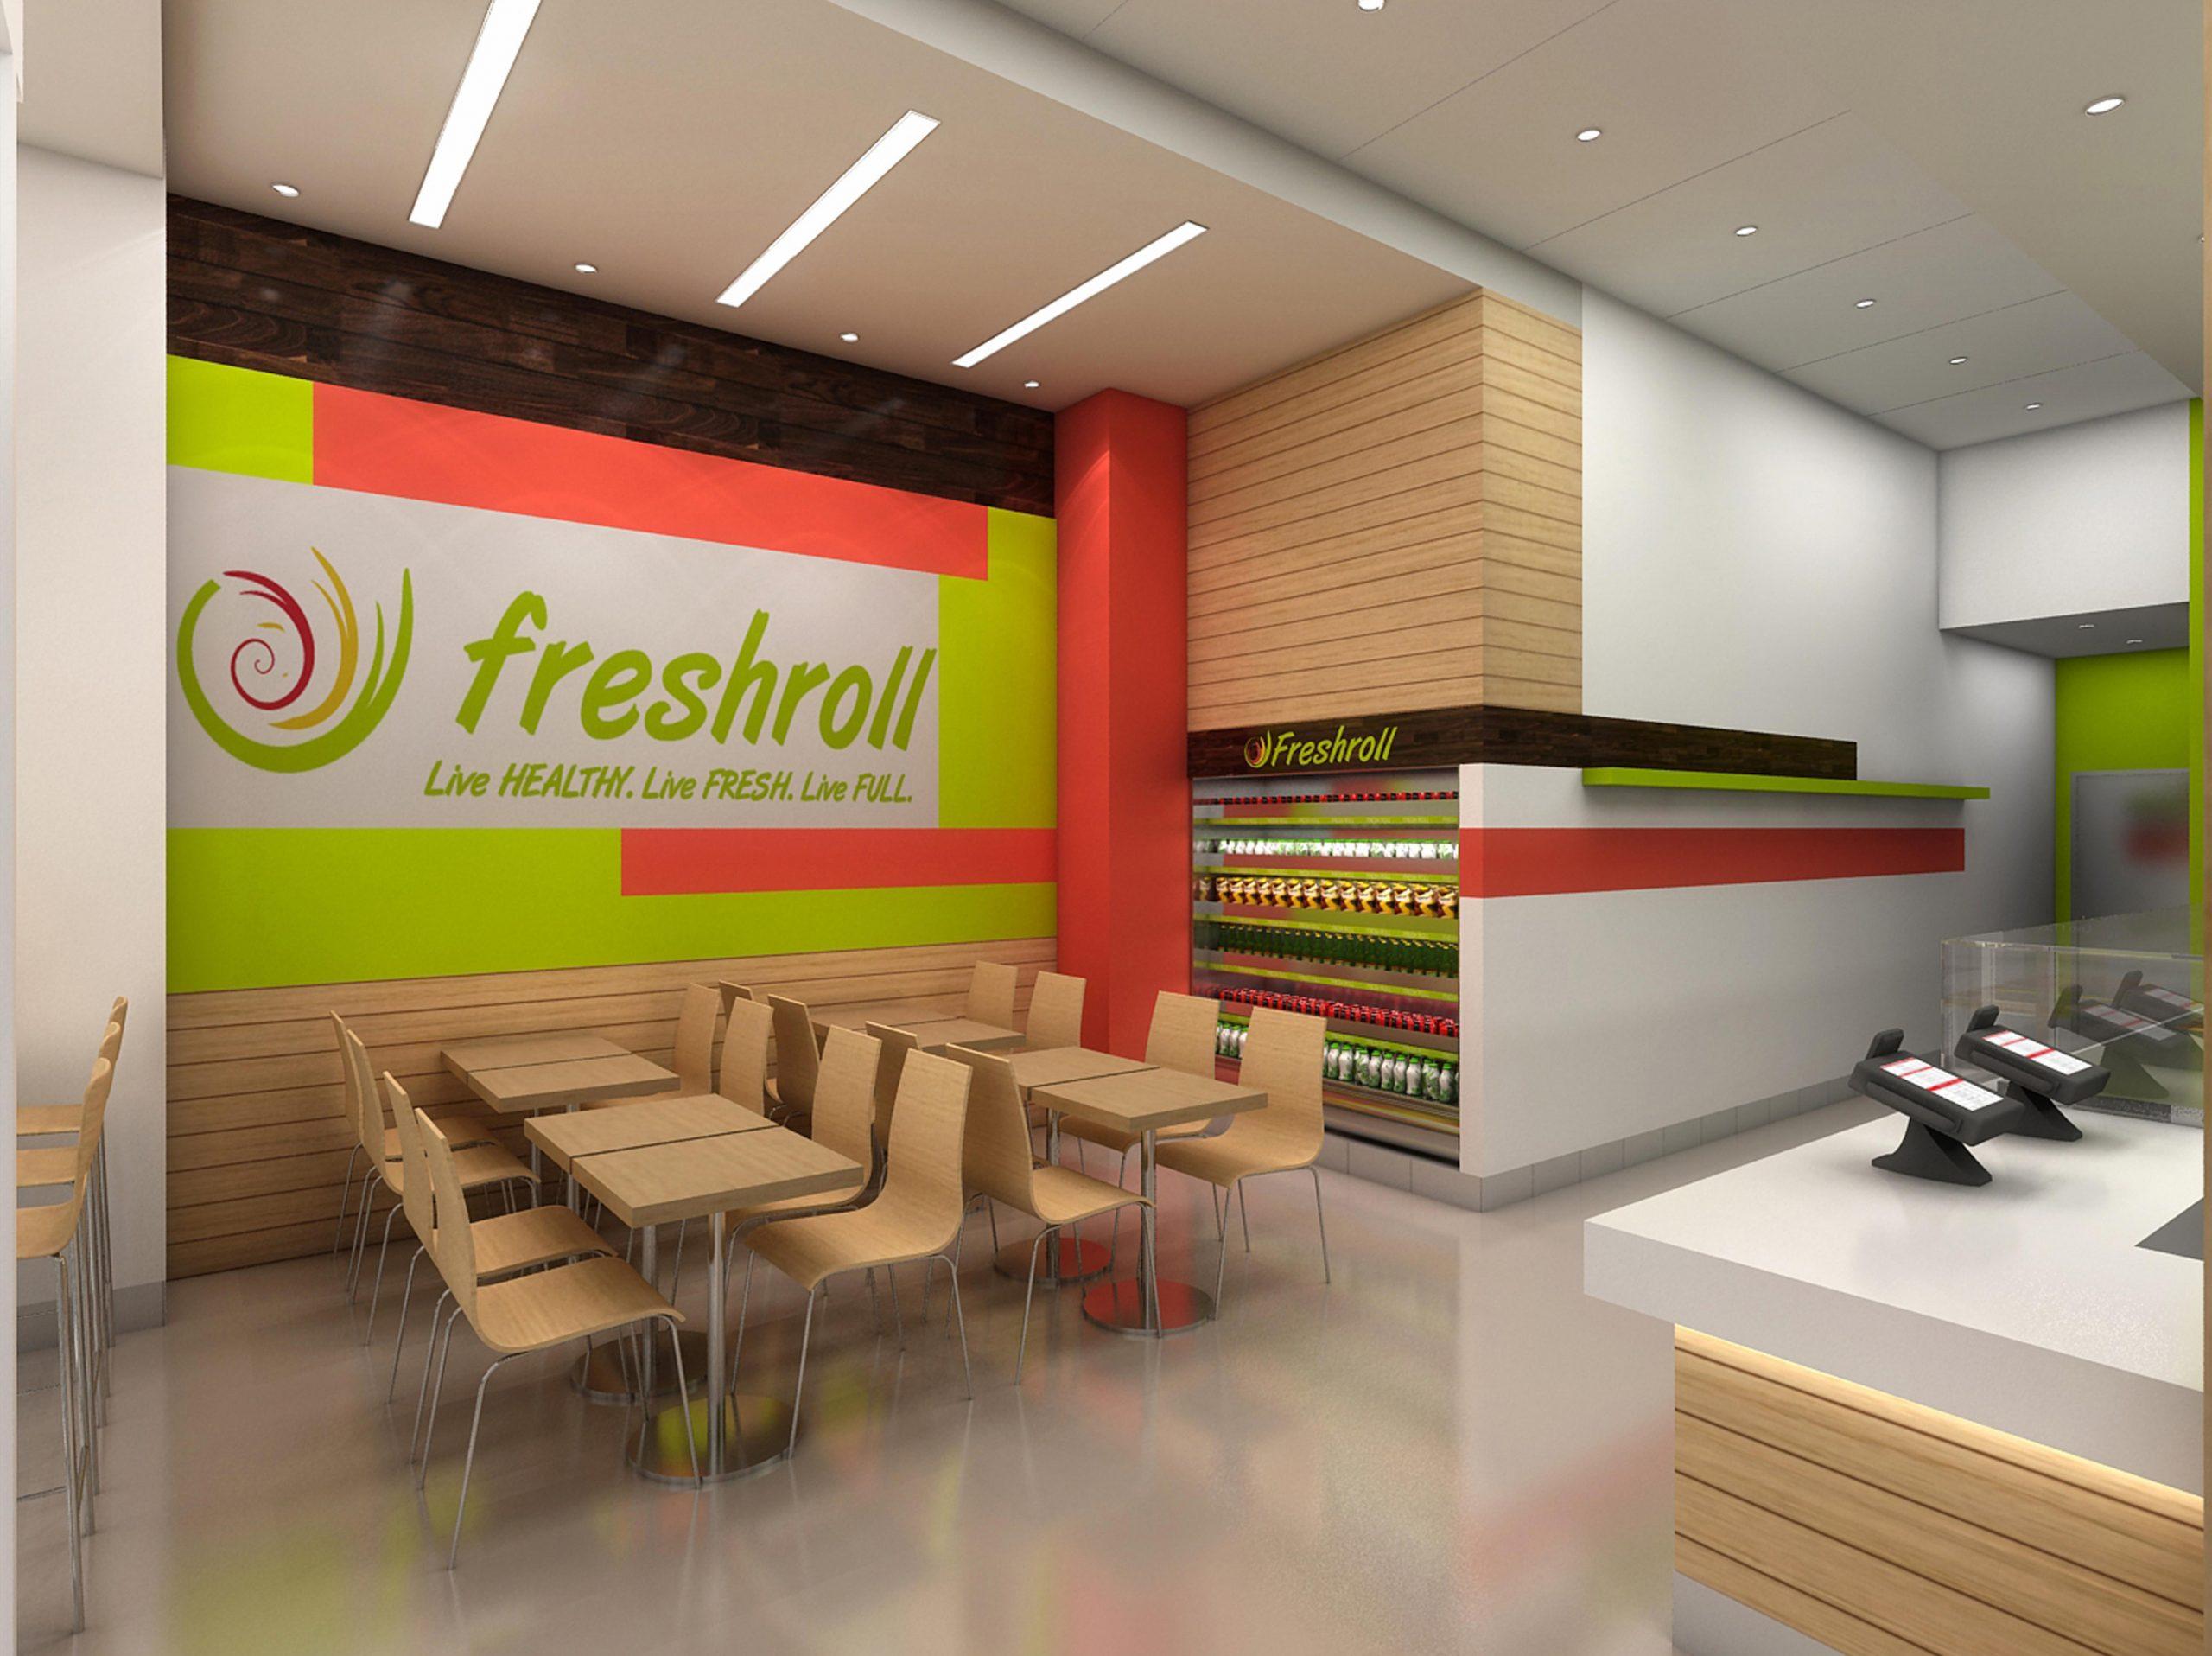 Freshroll-at-The-Metreon-San-Francisco-CA-Rendering-3